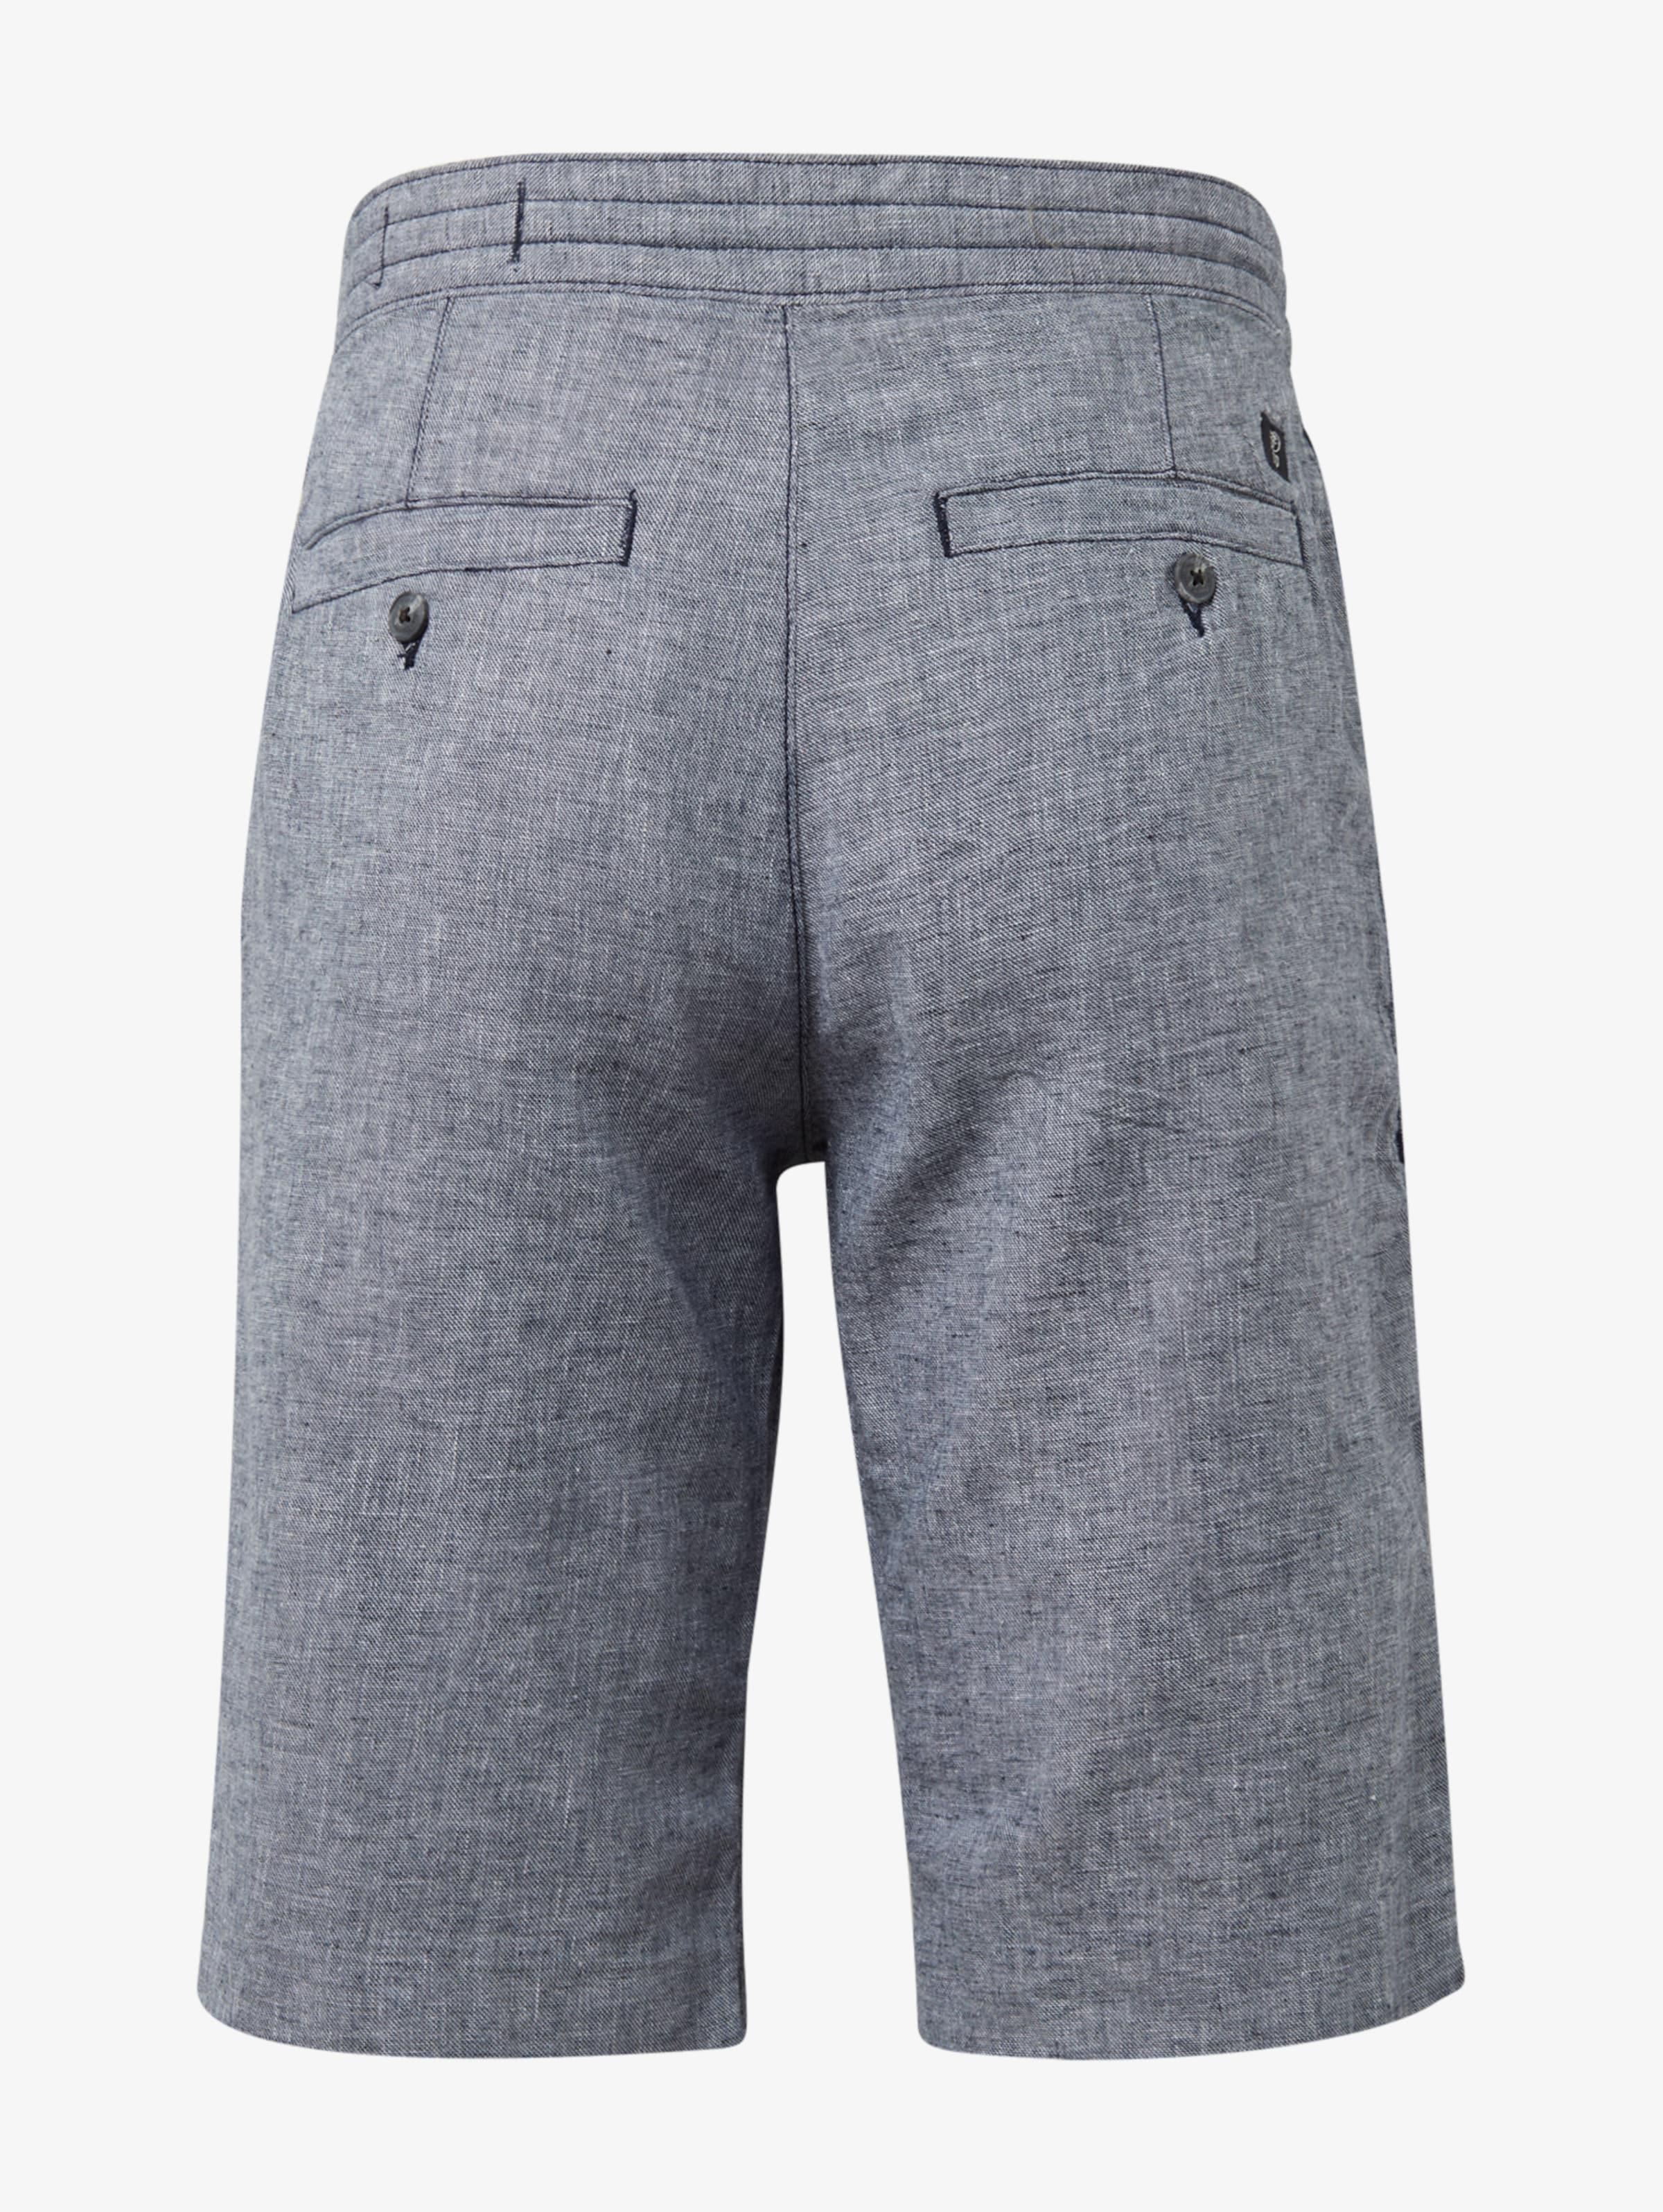 Tom Denim Tailor Shorts In Taubenblau O80nwPk